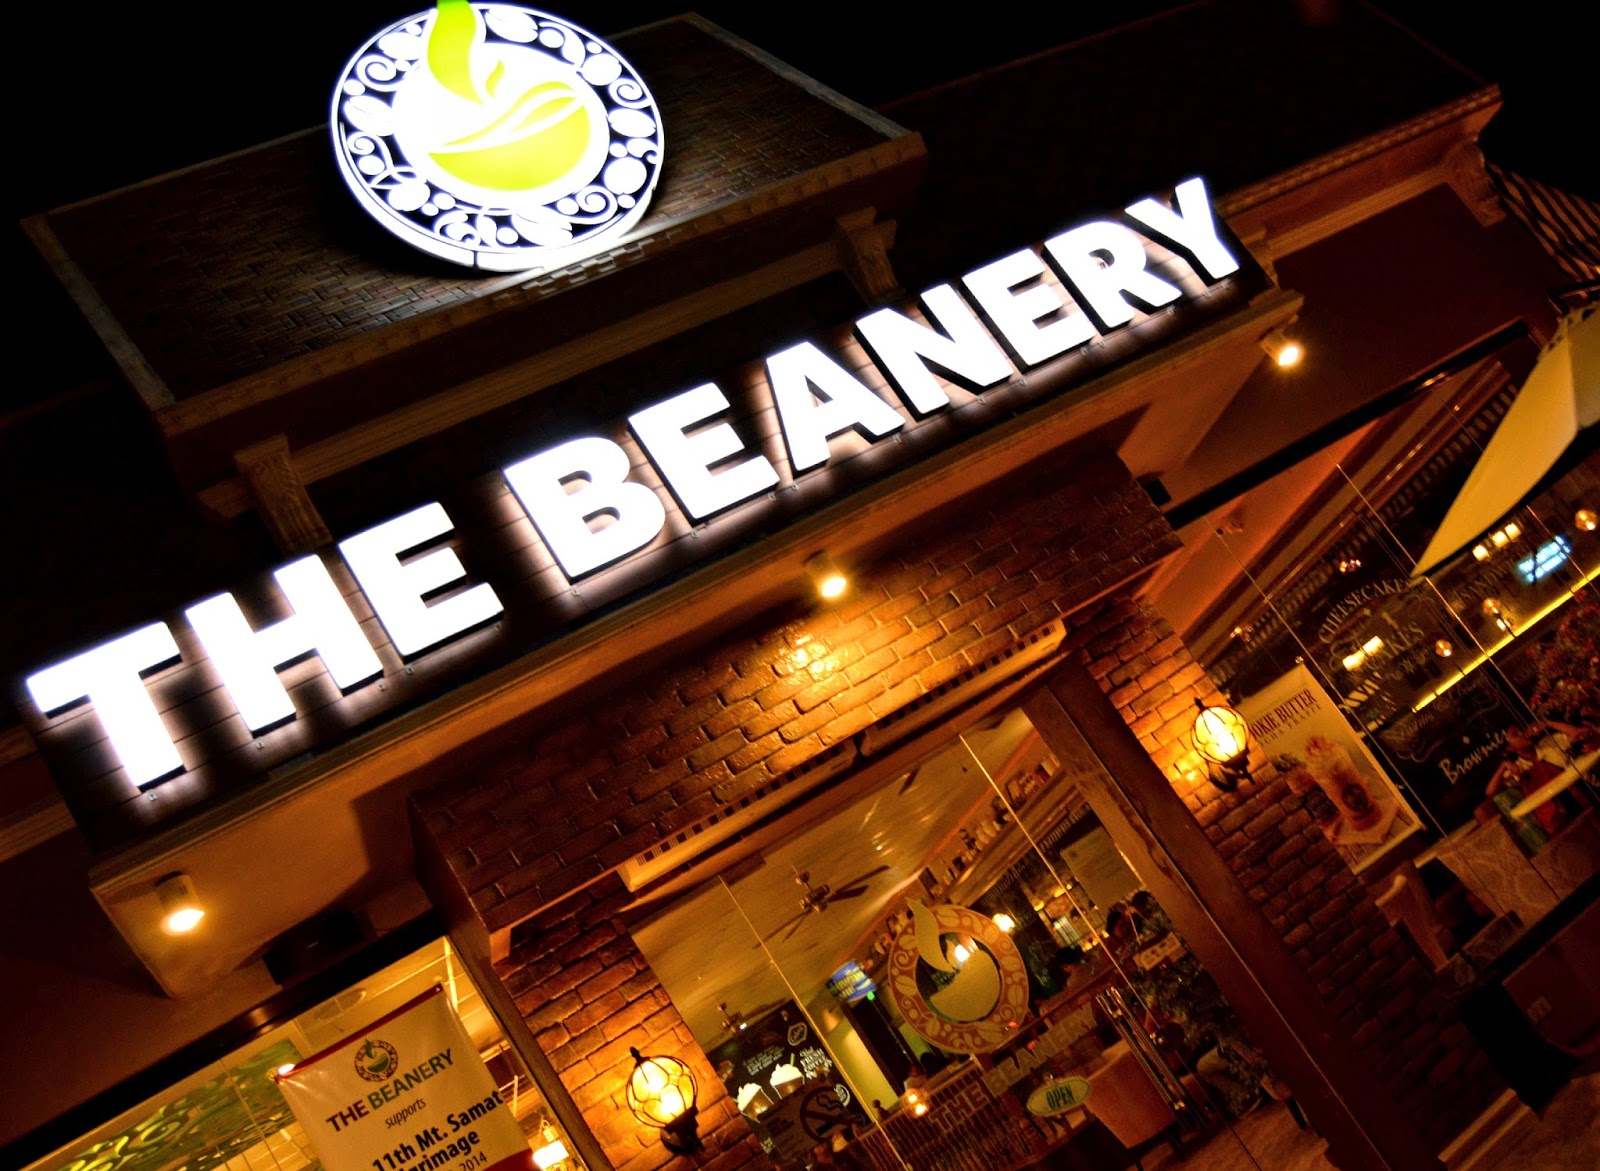 Must Love Bataan | The Beanery